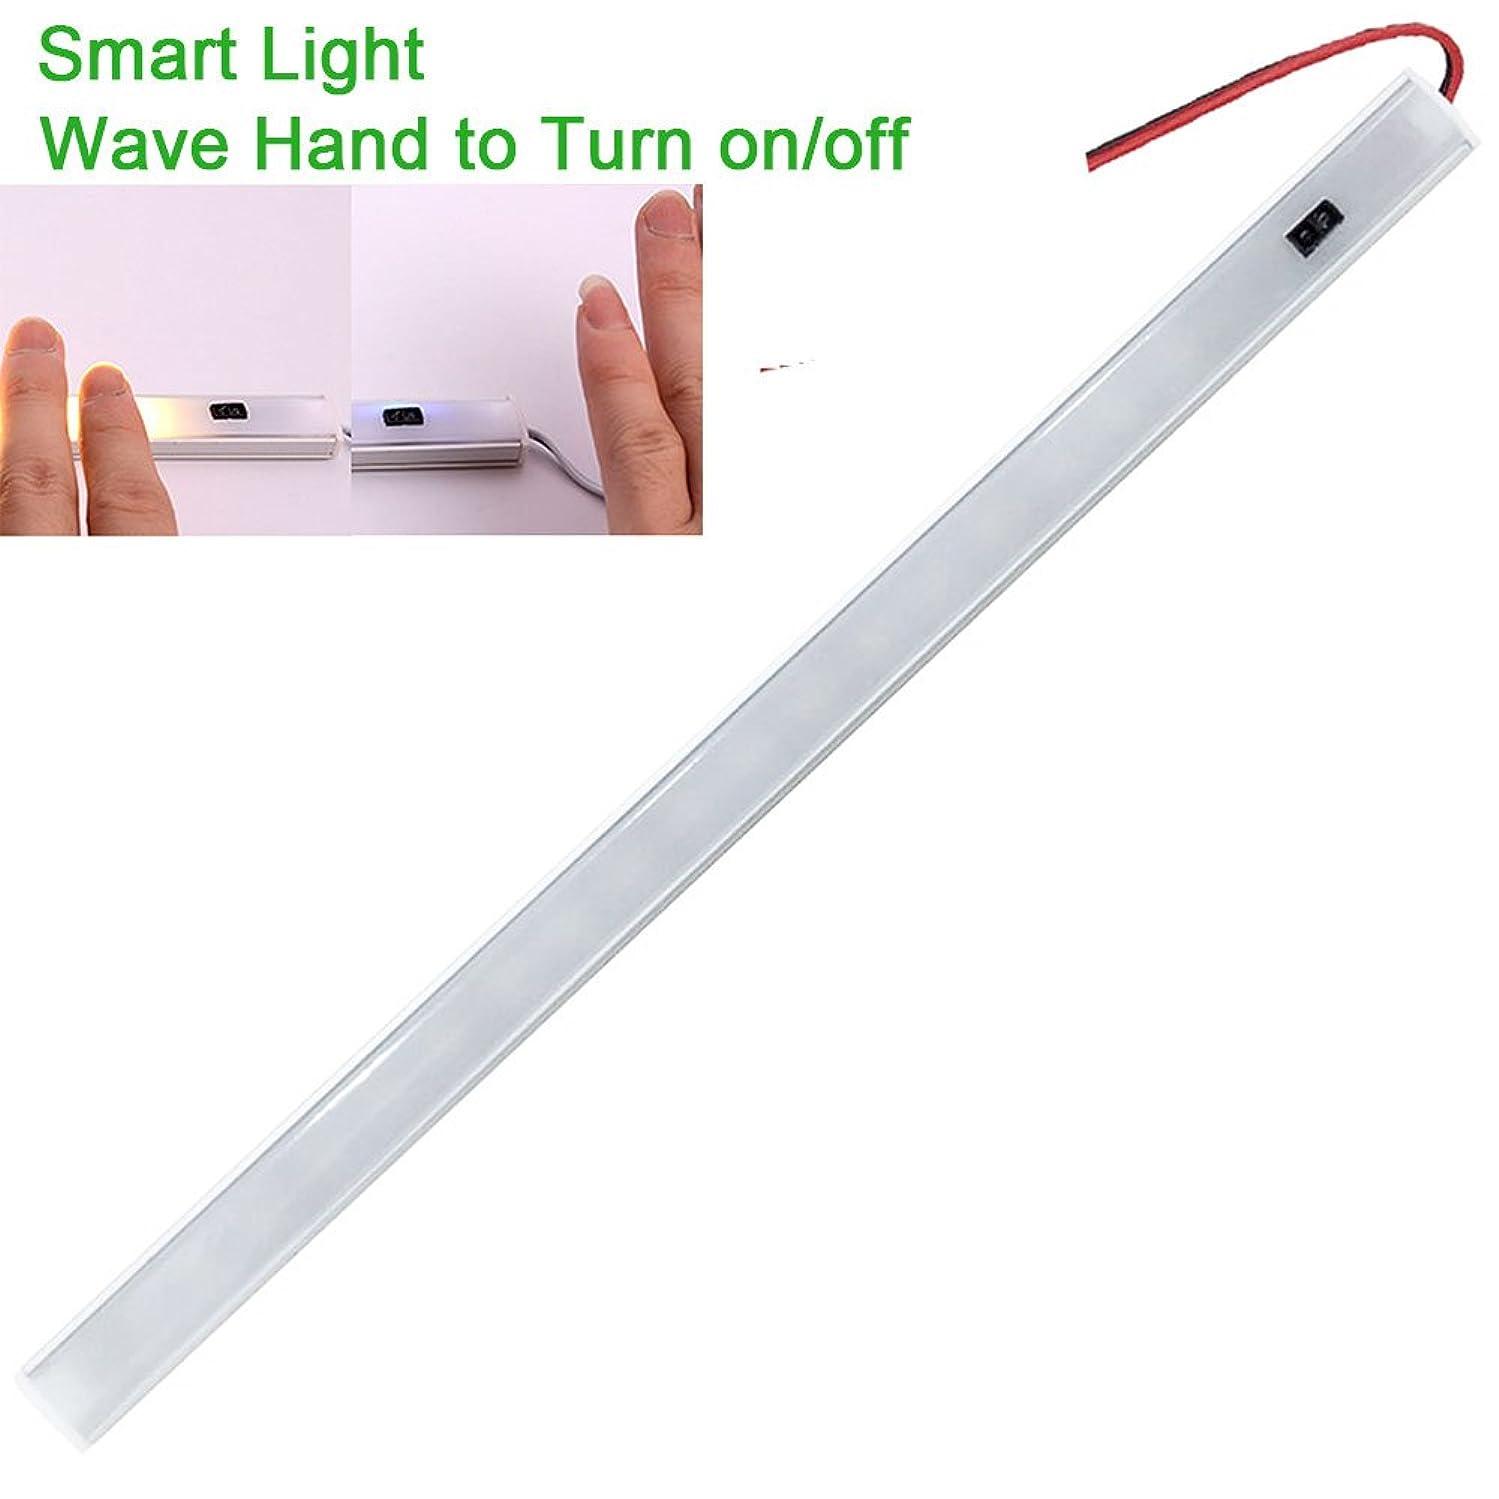 12v-LEDlight Smart Cabinet Light Bar (WAVE HAND TO TURN ON) LED Counter Light Fixture - RV Camper Motorhome Truck Interior Lighting 12V 6W Natural White LED